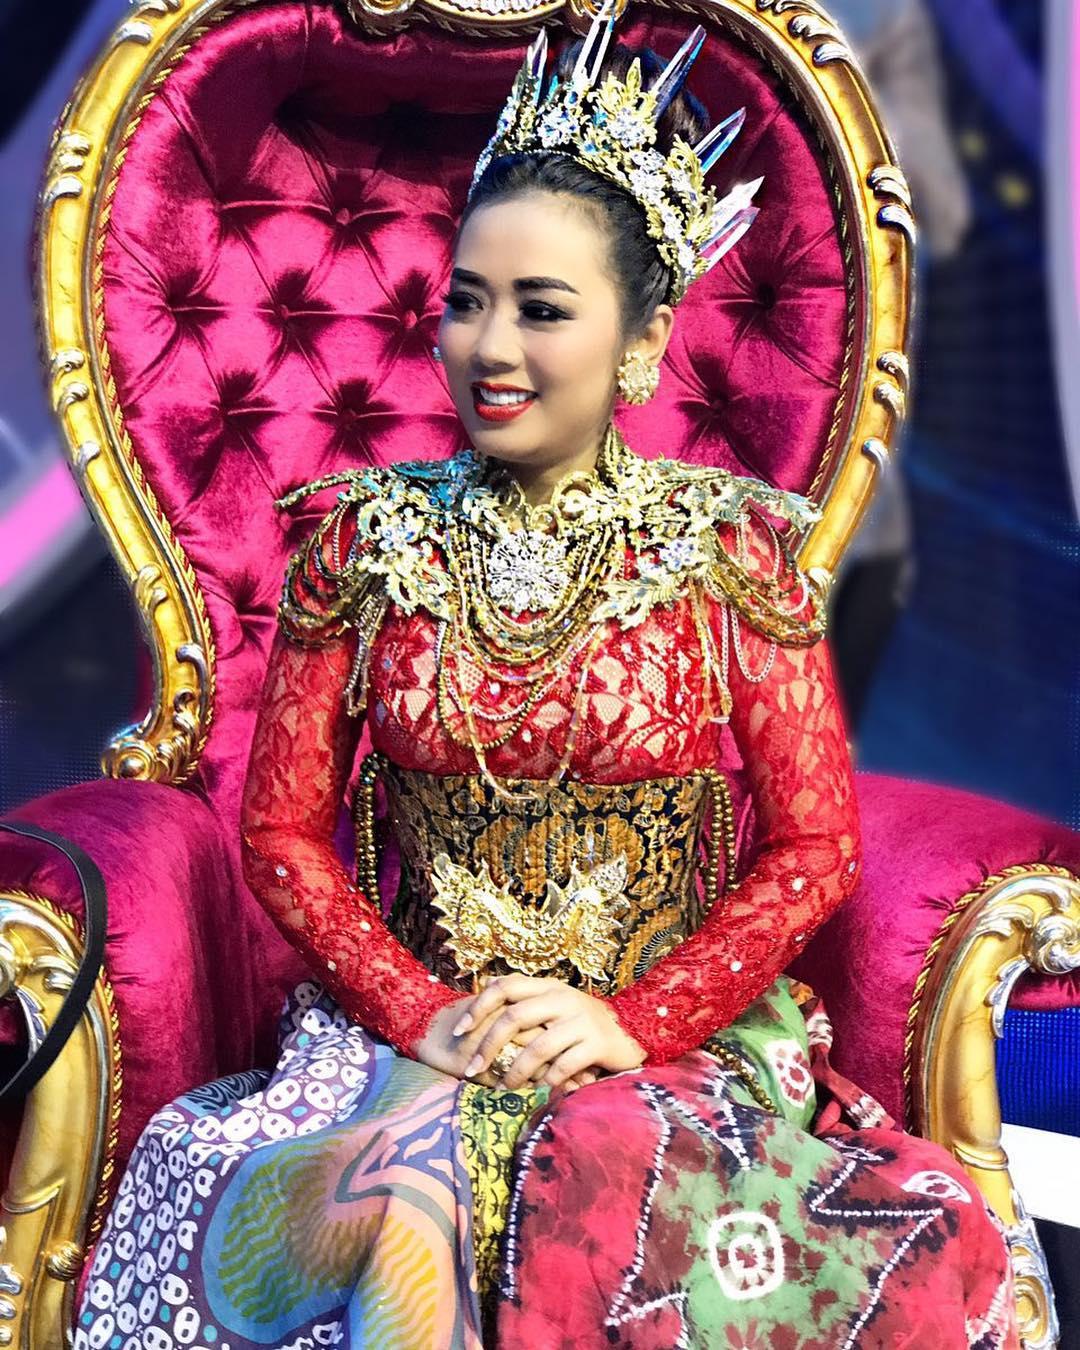 Koleksi Foto Hot Soimah Penyanyi Dangdut